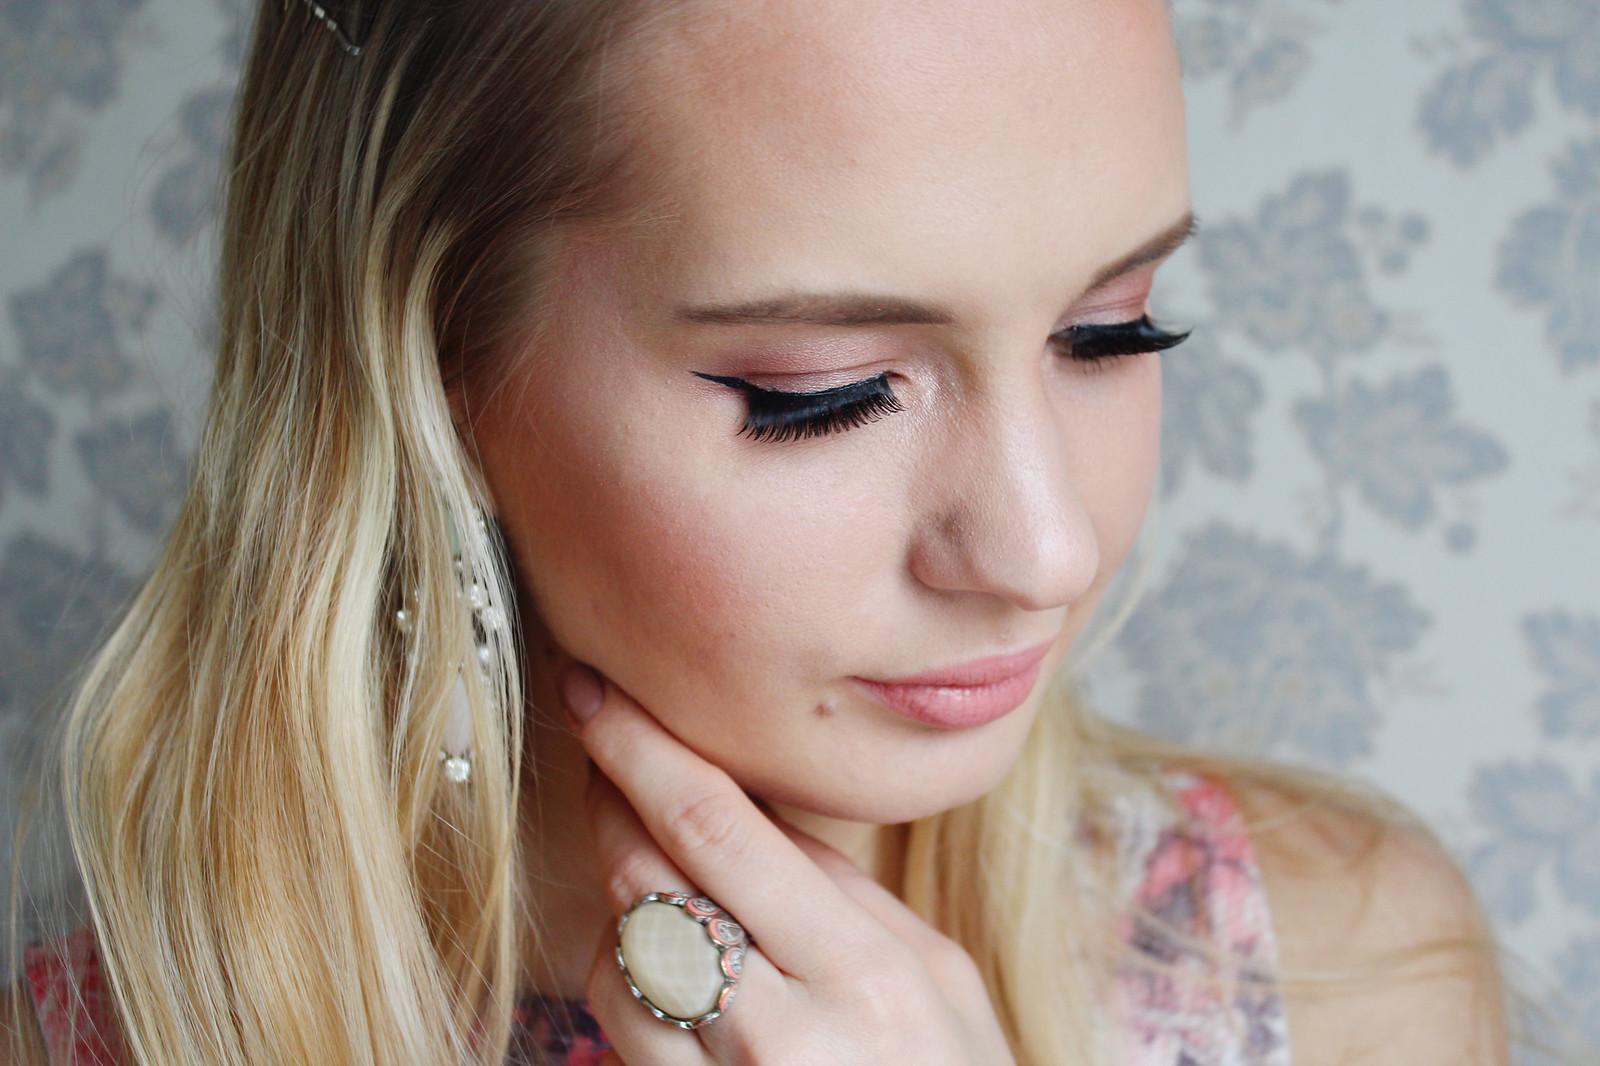 Fake eye lashes from Catrice